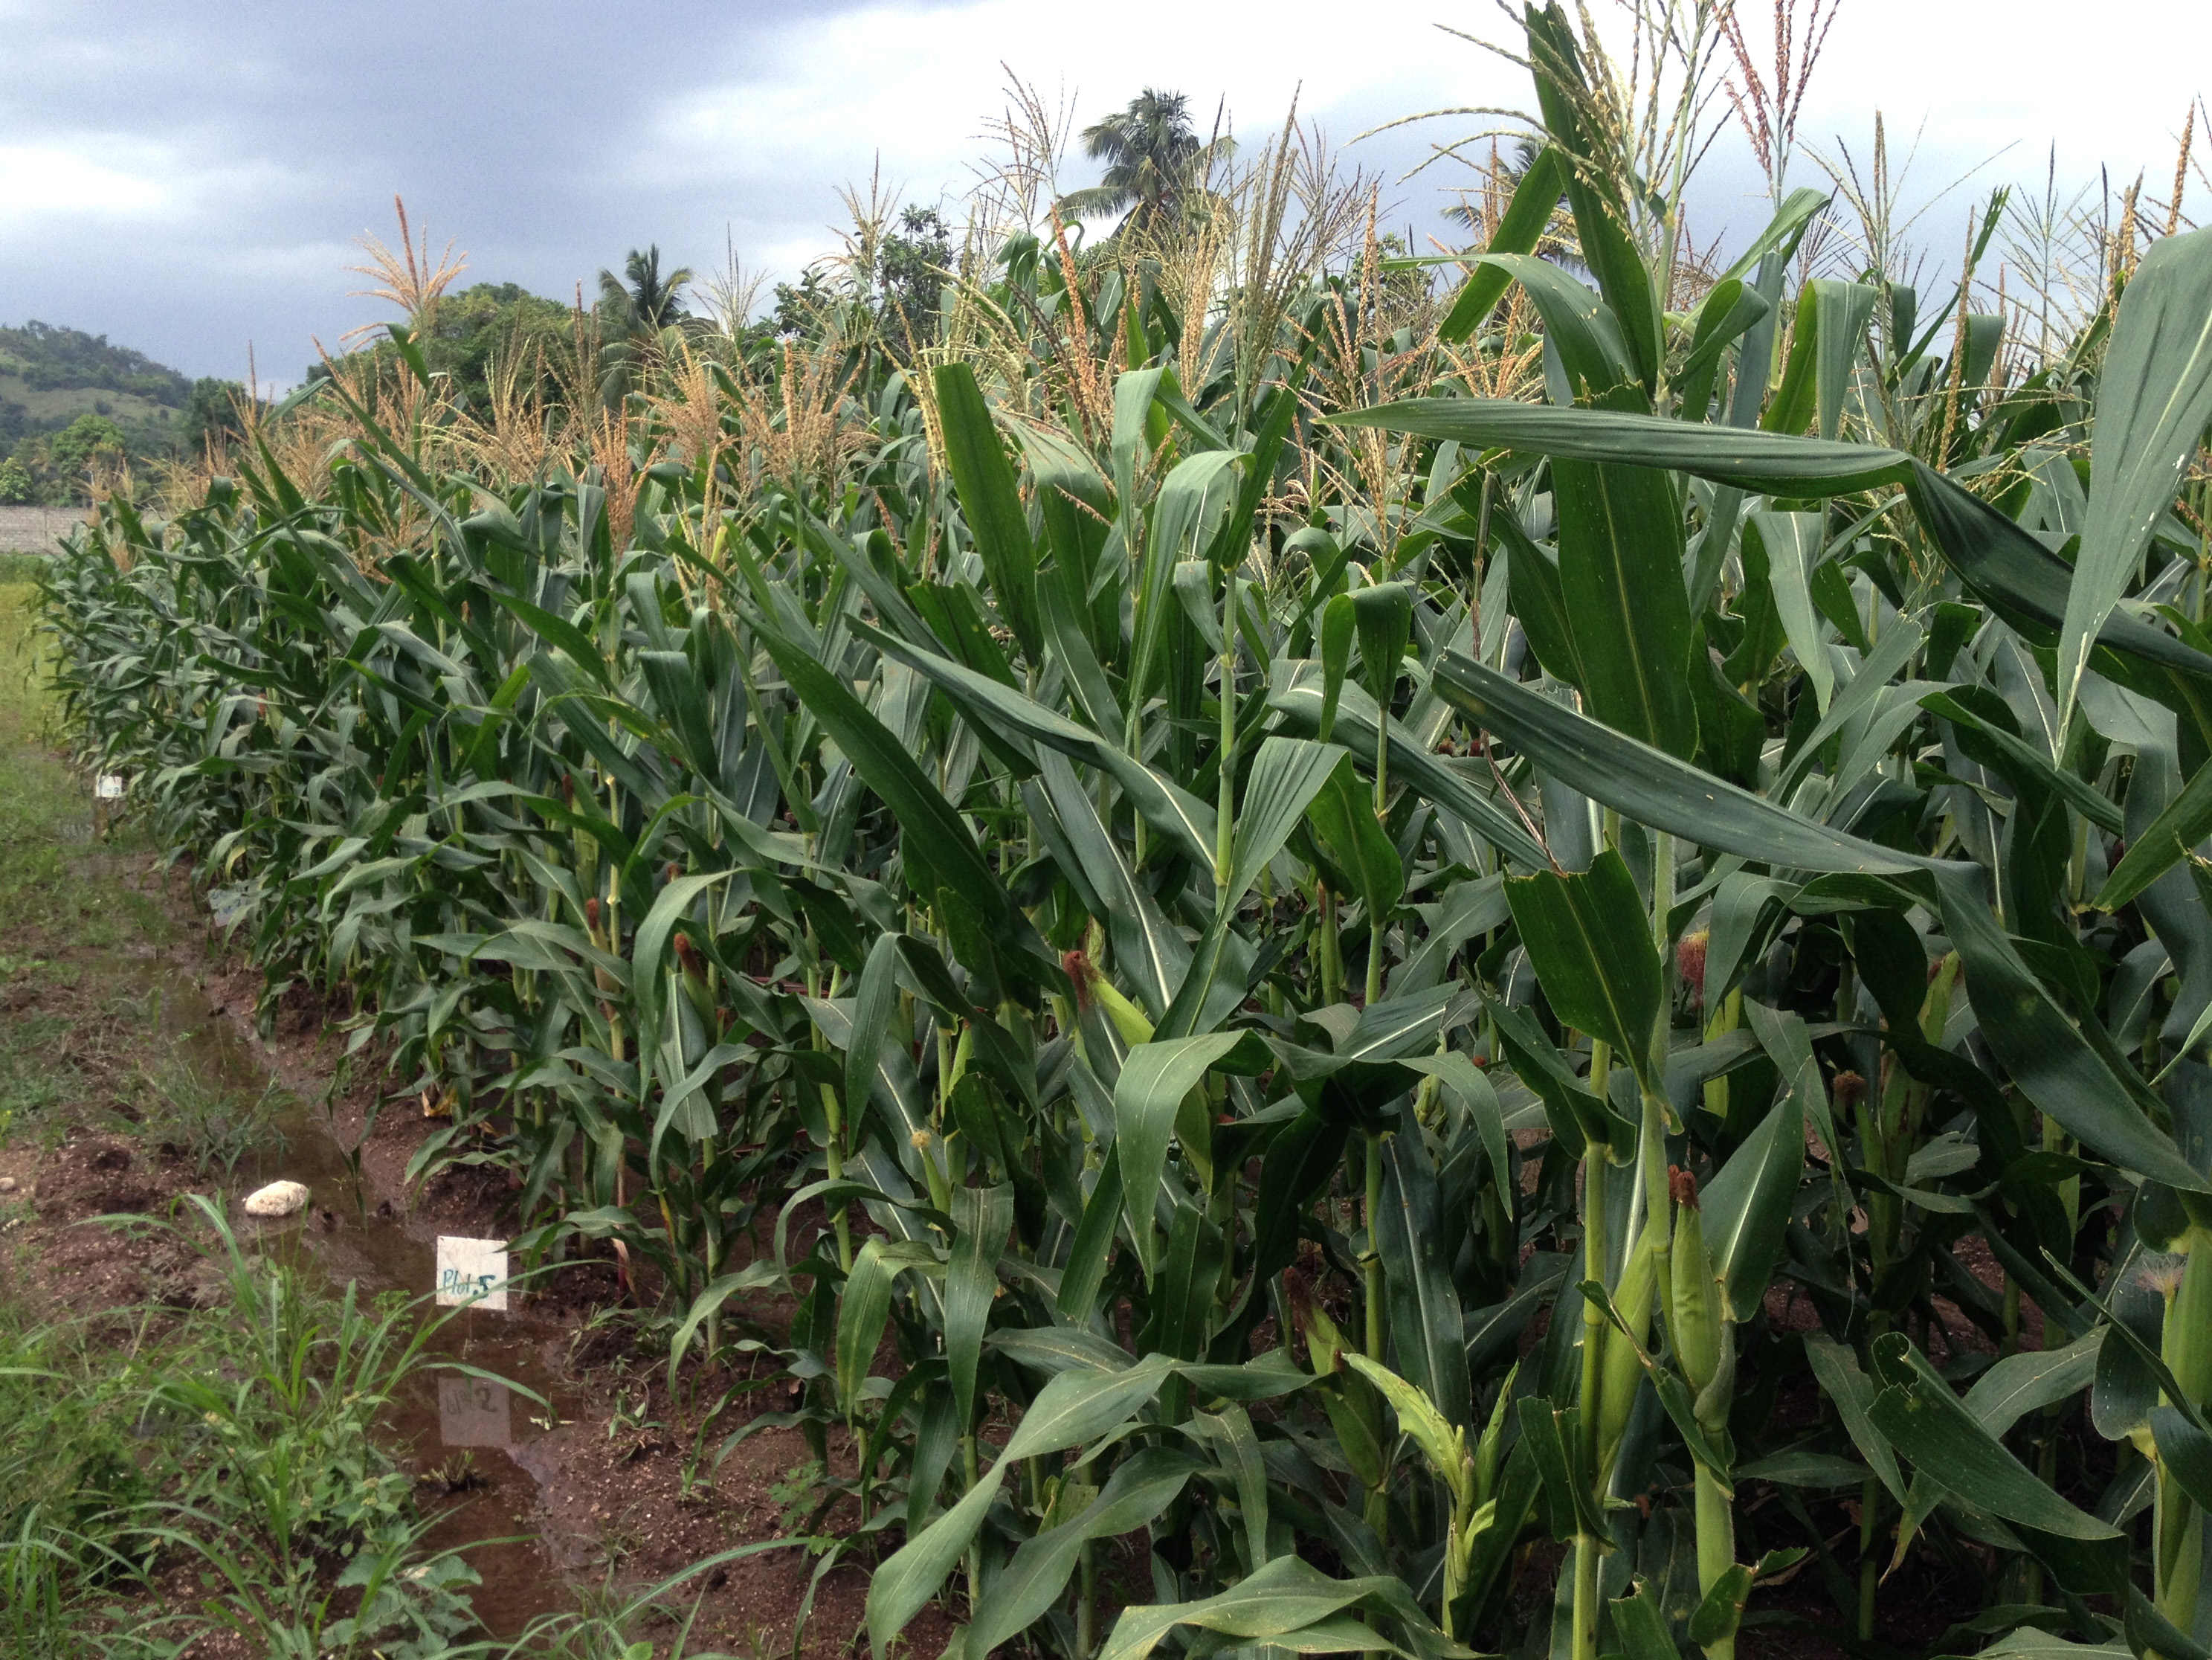 Hugo maize growing in Haiti. CIMMYT/Alberto Chassaigne